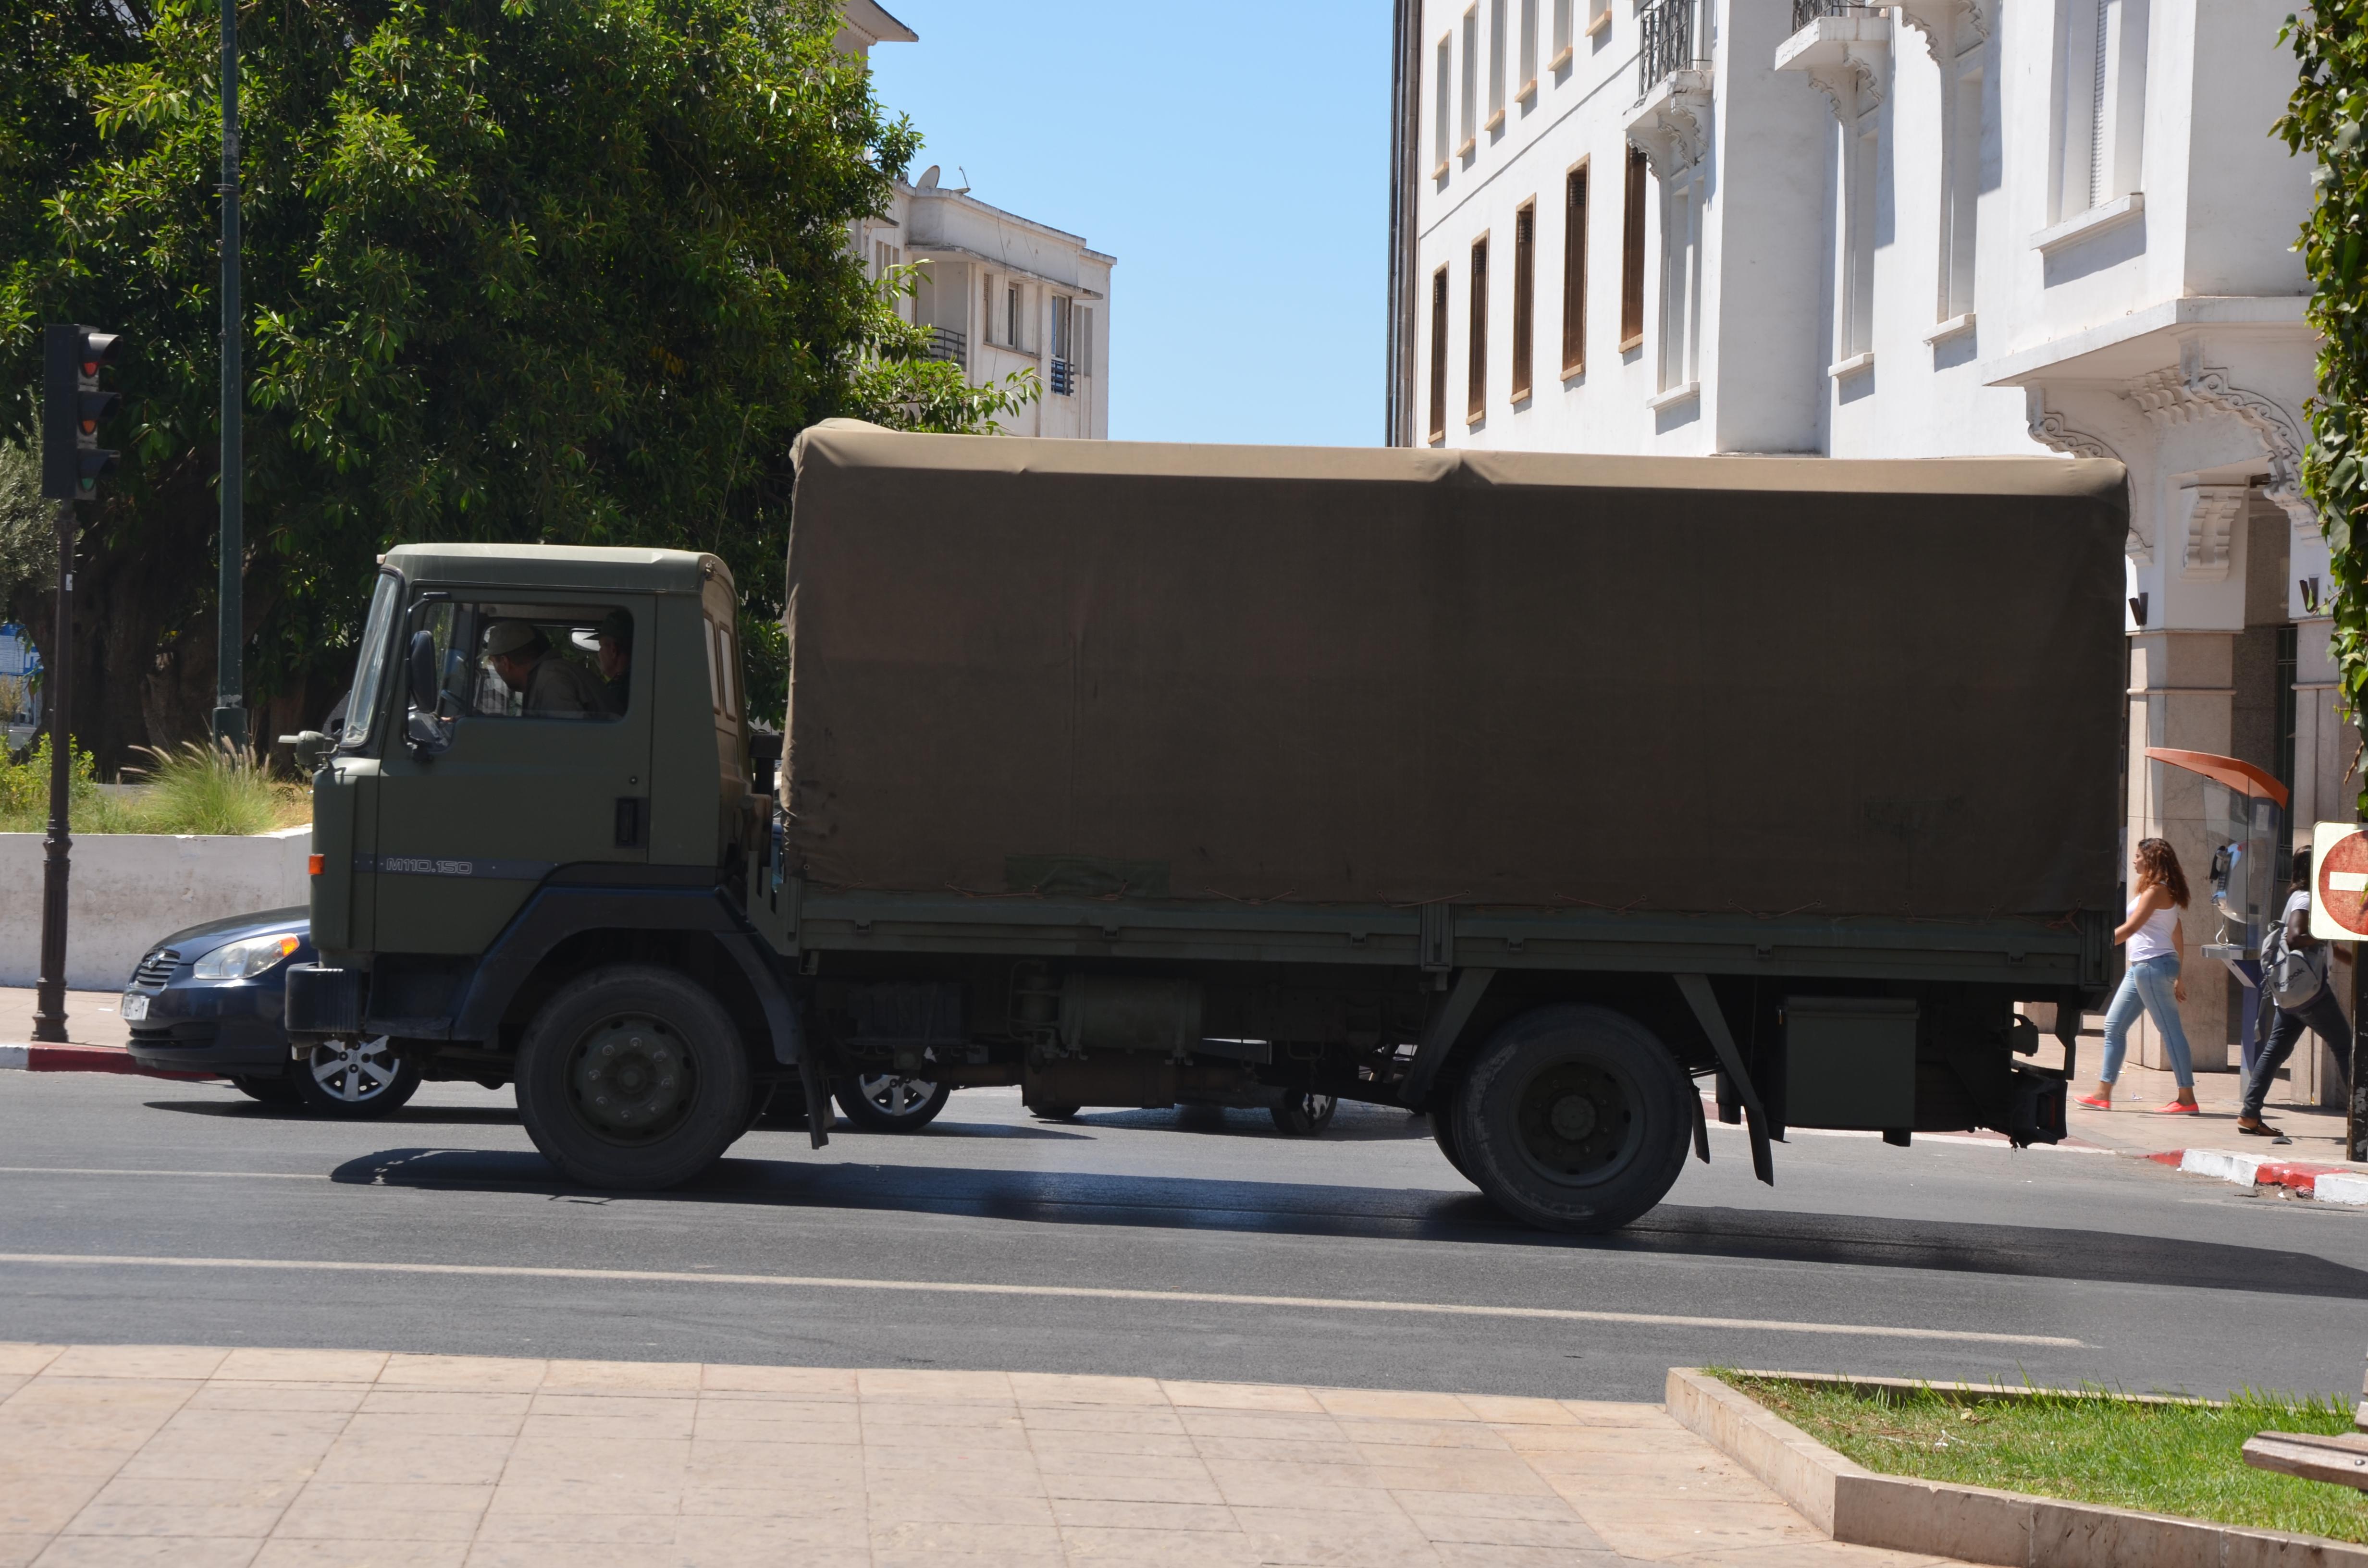 Photos - Logistique et Camions / Logistics and Trucks - Page 7 29465913220_26e677a302_o